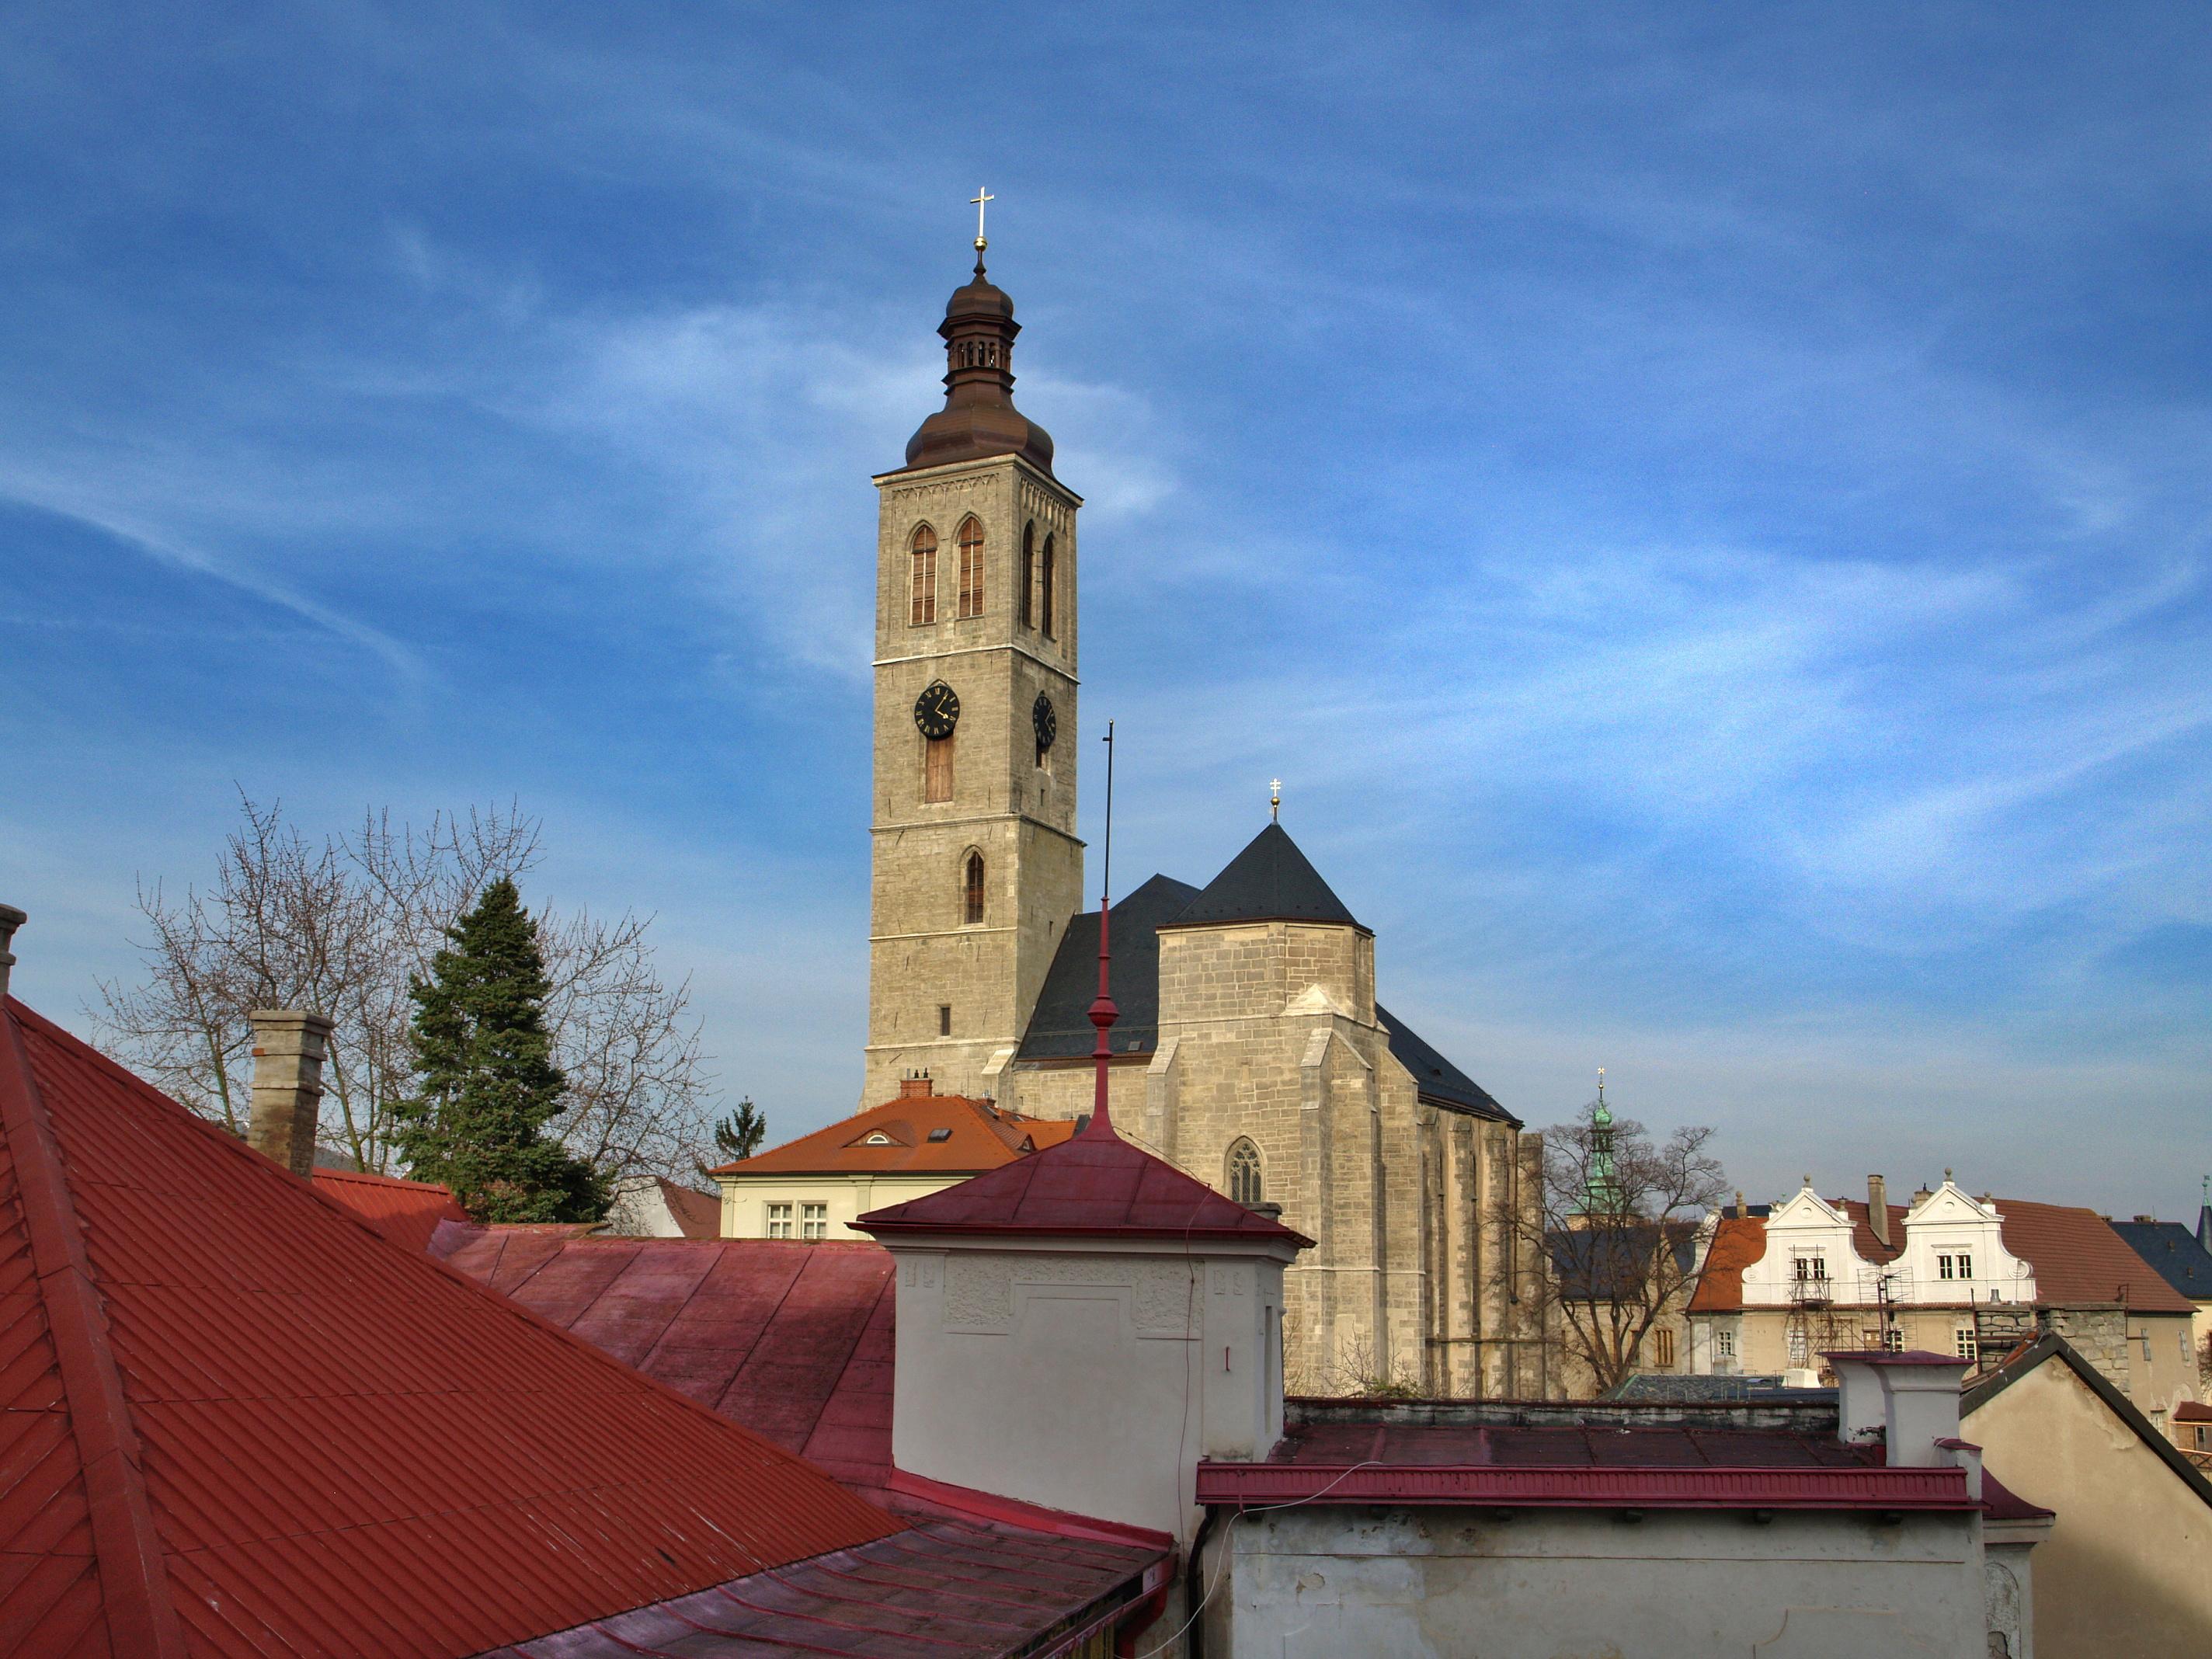 10352-kostel-sv-jakuba-st-james-church-2.jpg